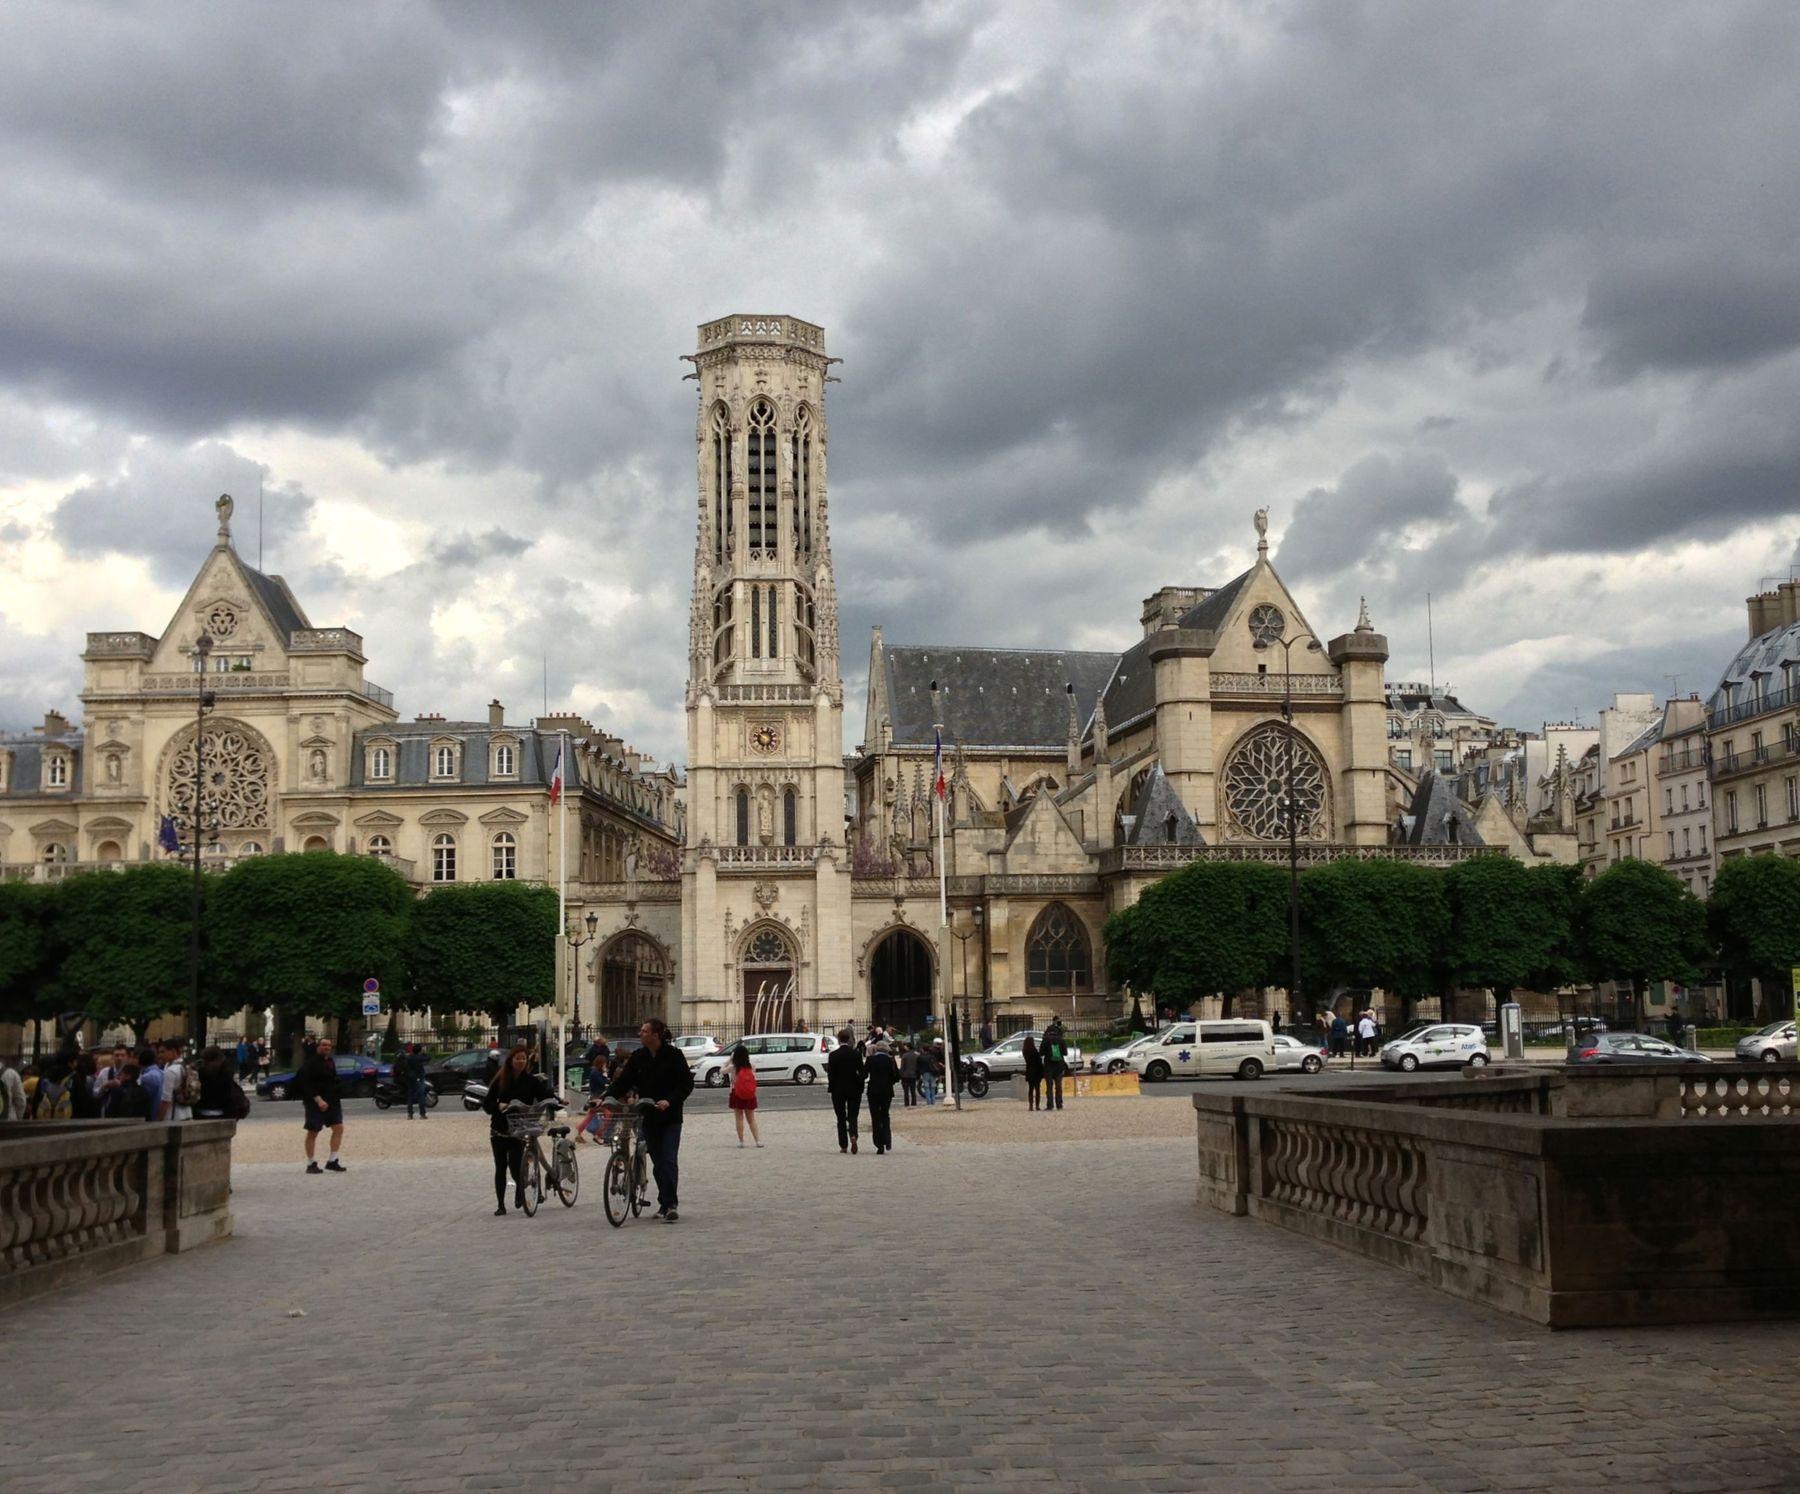 Церковь Сен-Жерме́н-л'Осеруа́ Париж церковь Сен-Жерме н-л Осеруа облака